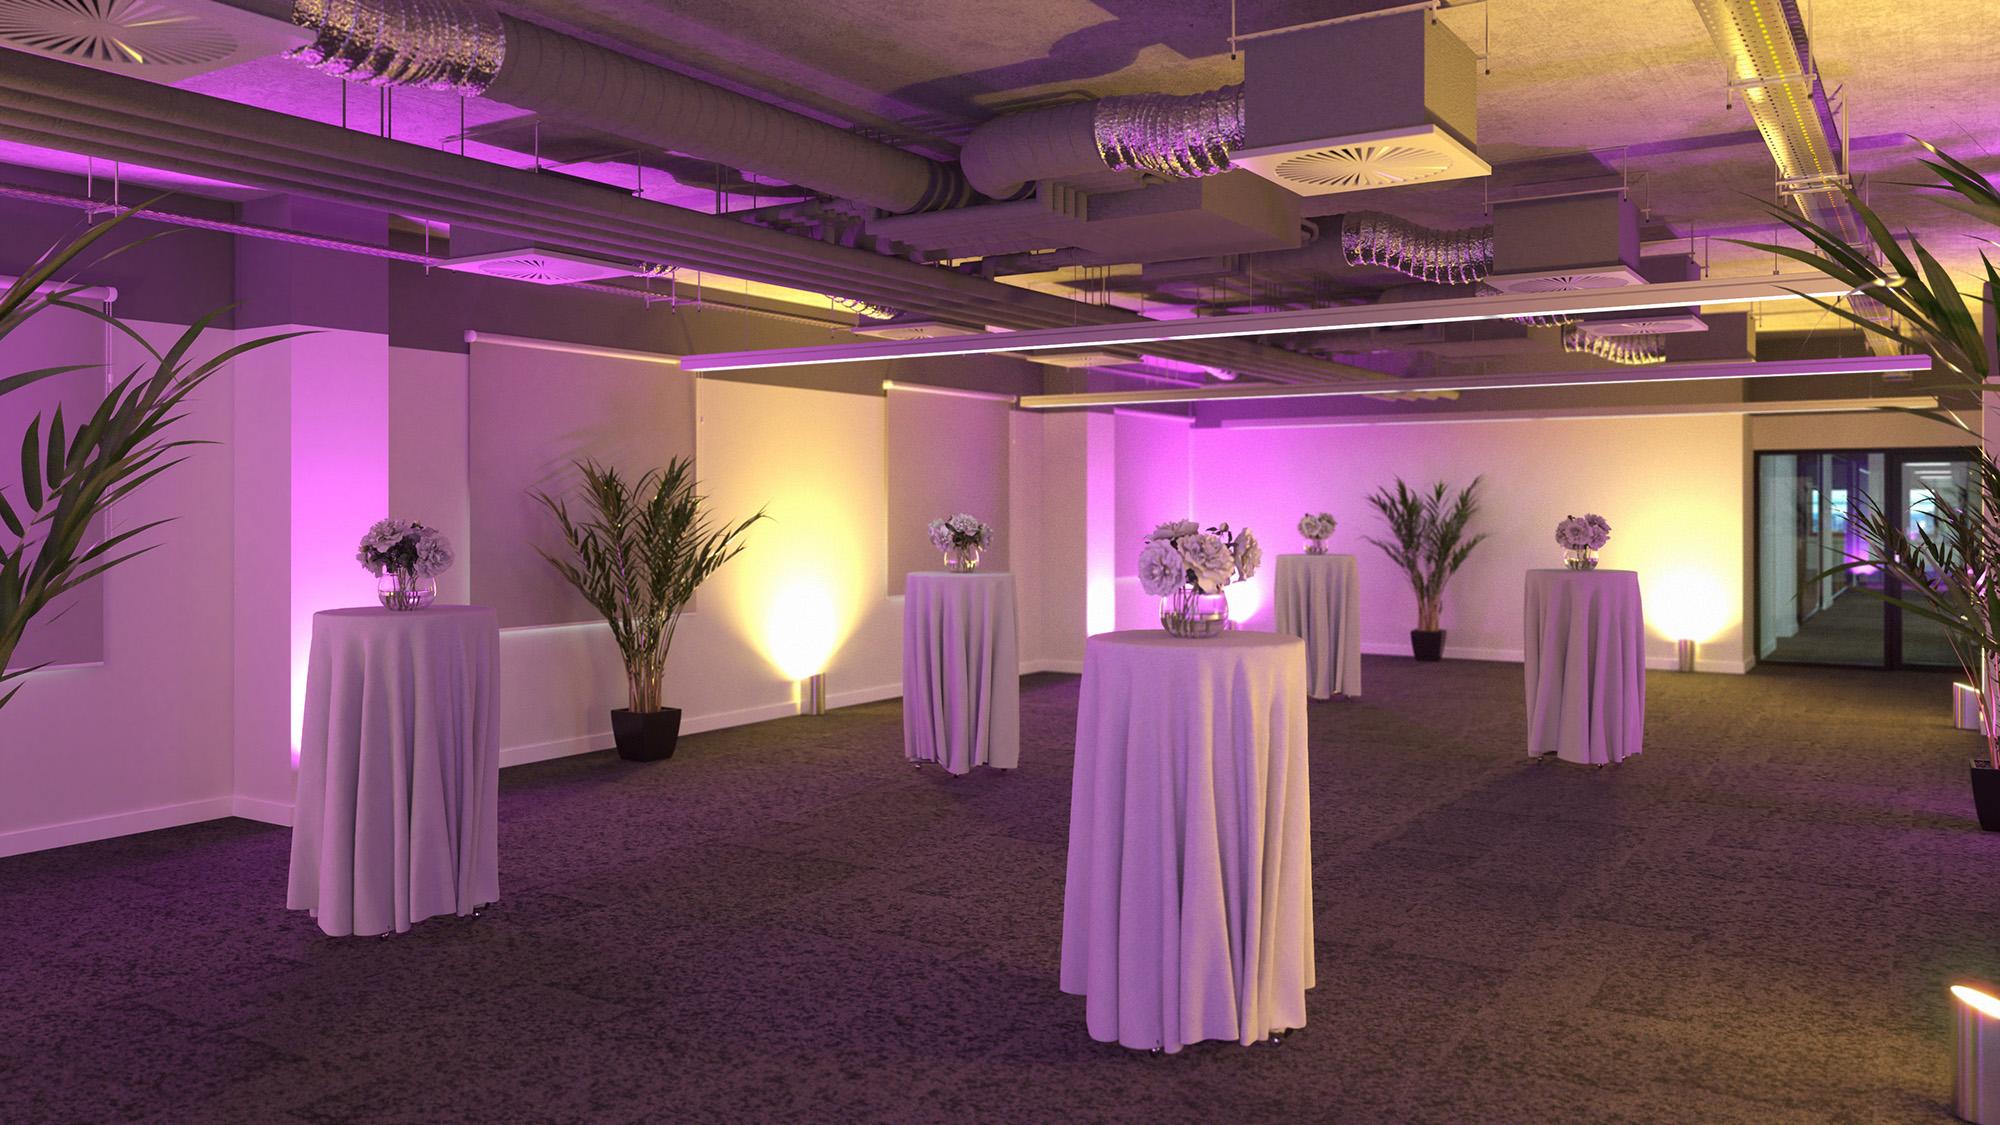 Drinks Reception Rooms - Venue for Hire Details at 10 Union Street, London Bridge